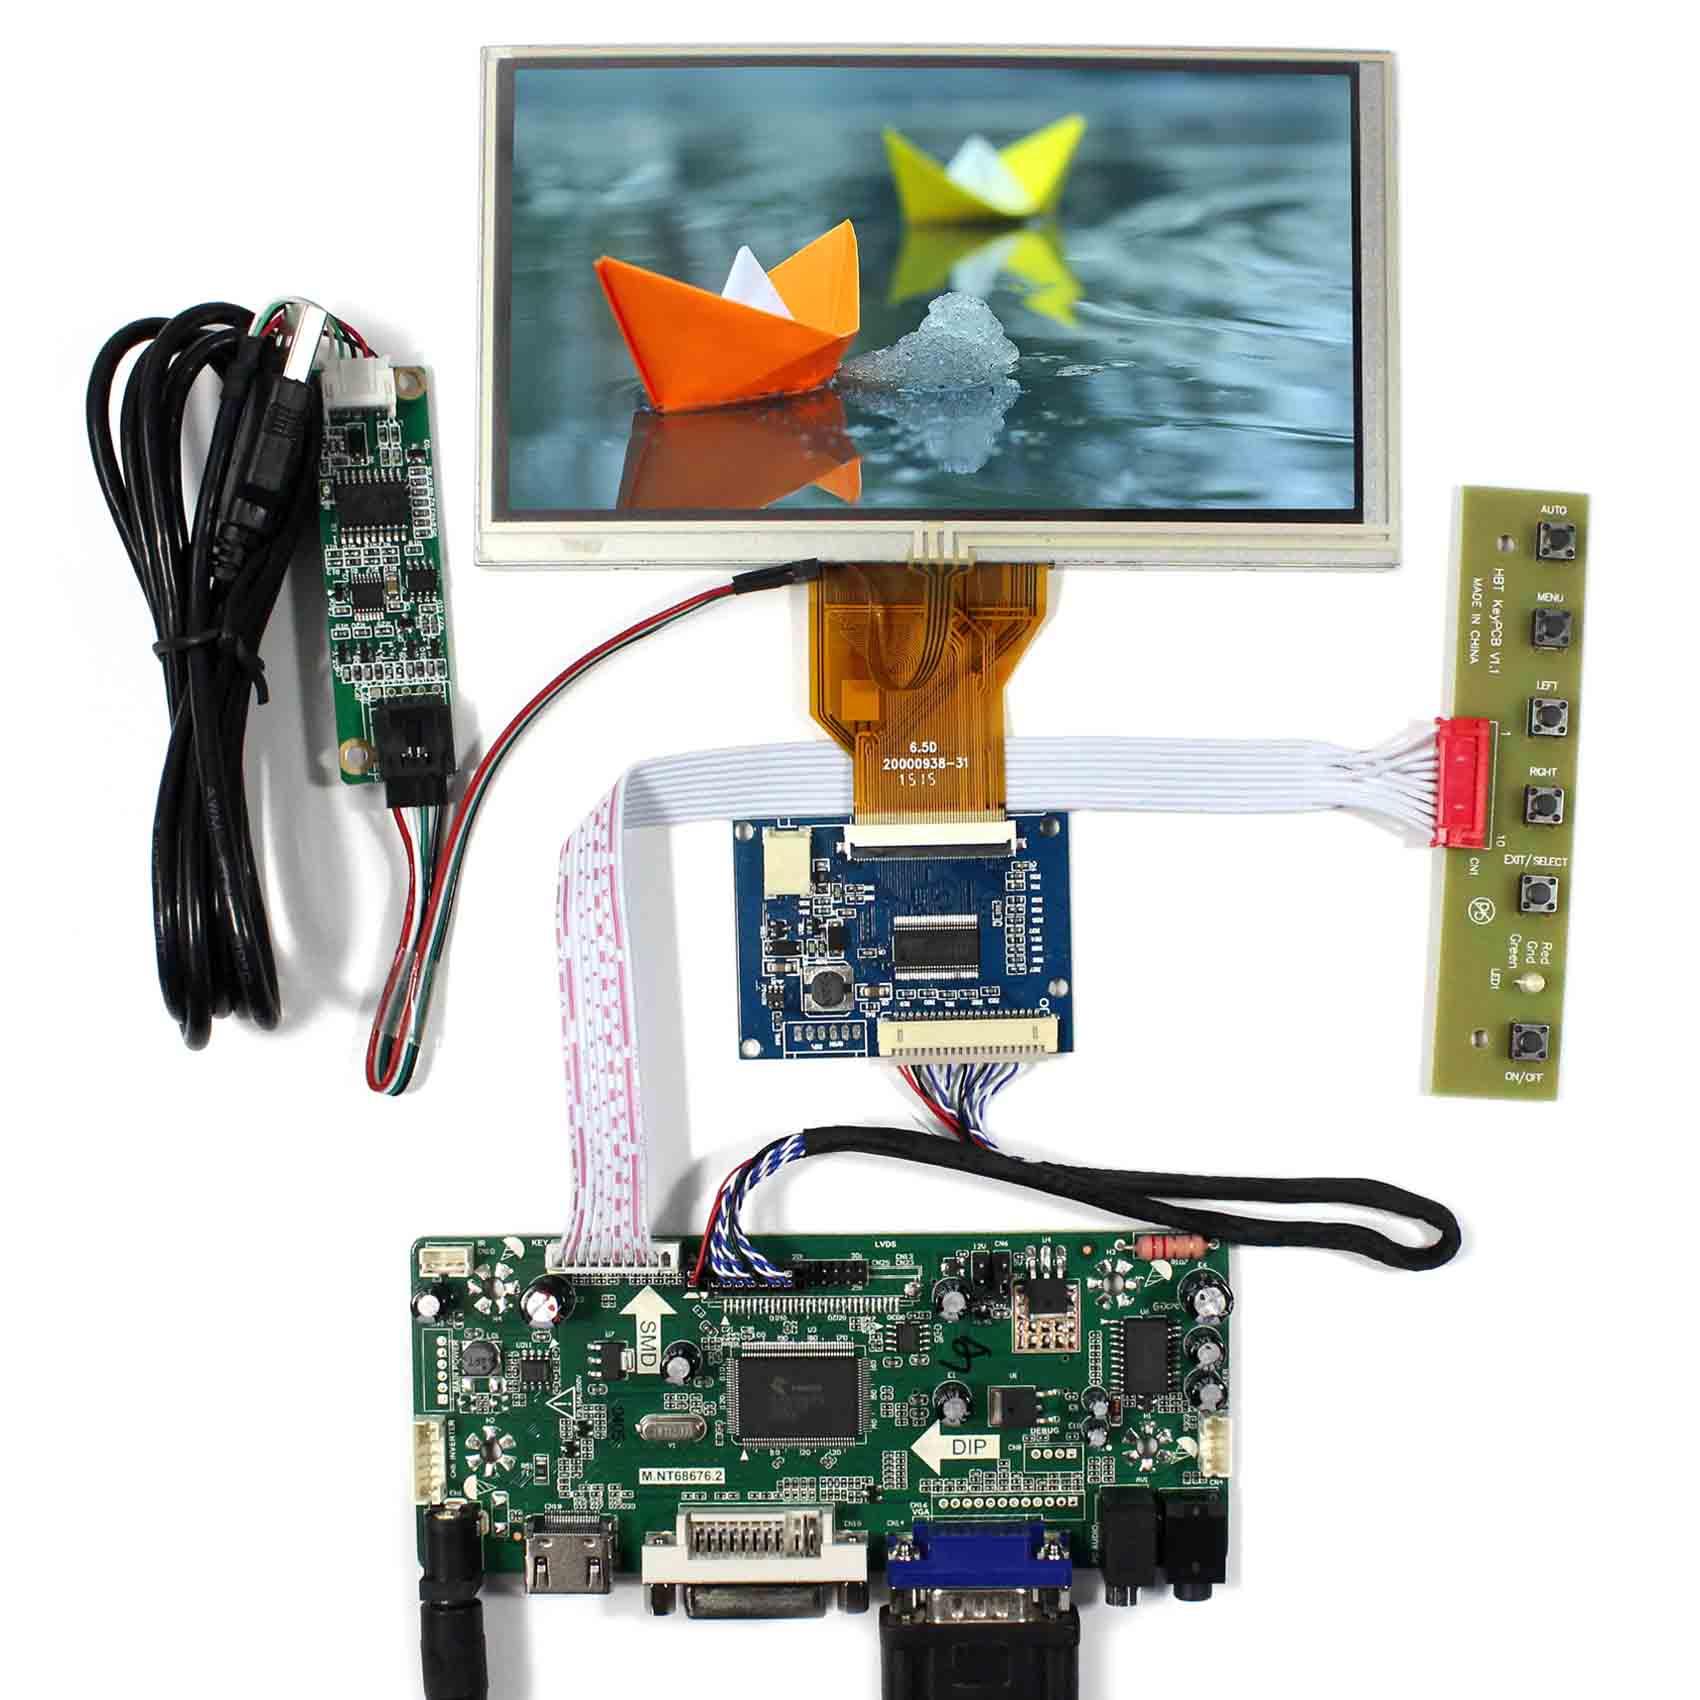 "6,5 ""ЖК-дисплей 6,5 дюймов 800x480 ЖК-экран VGA DVA HDMI AT065TN14 TP ЖК-драйвер ЖК-контроллер плата"